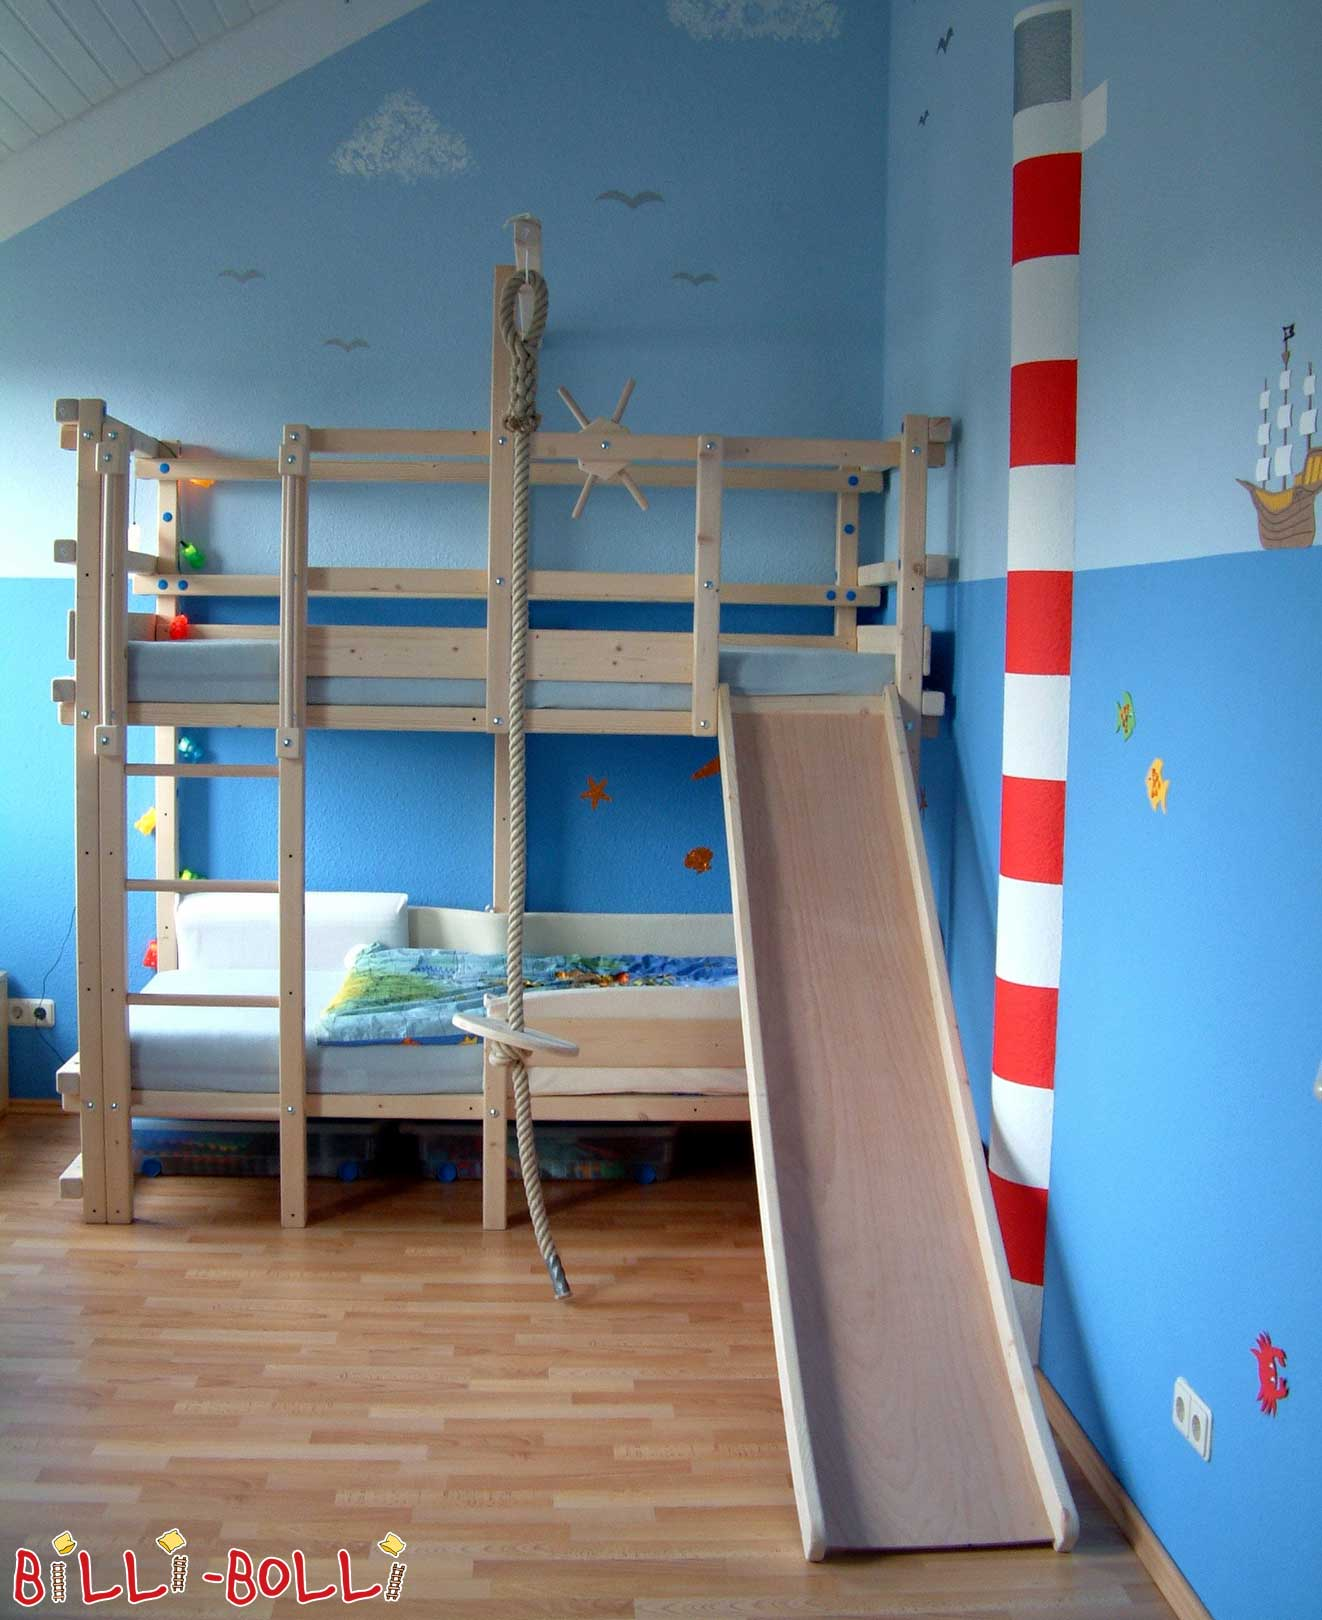 Slide Billi Bolli Kids Furniture